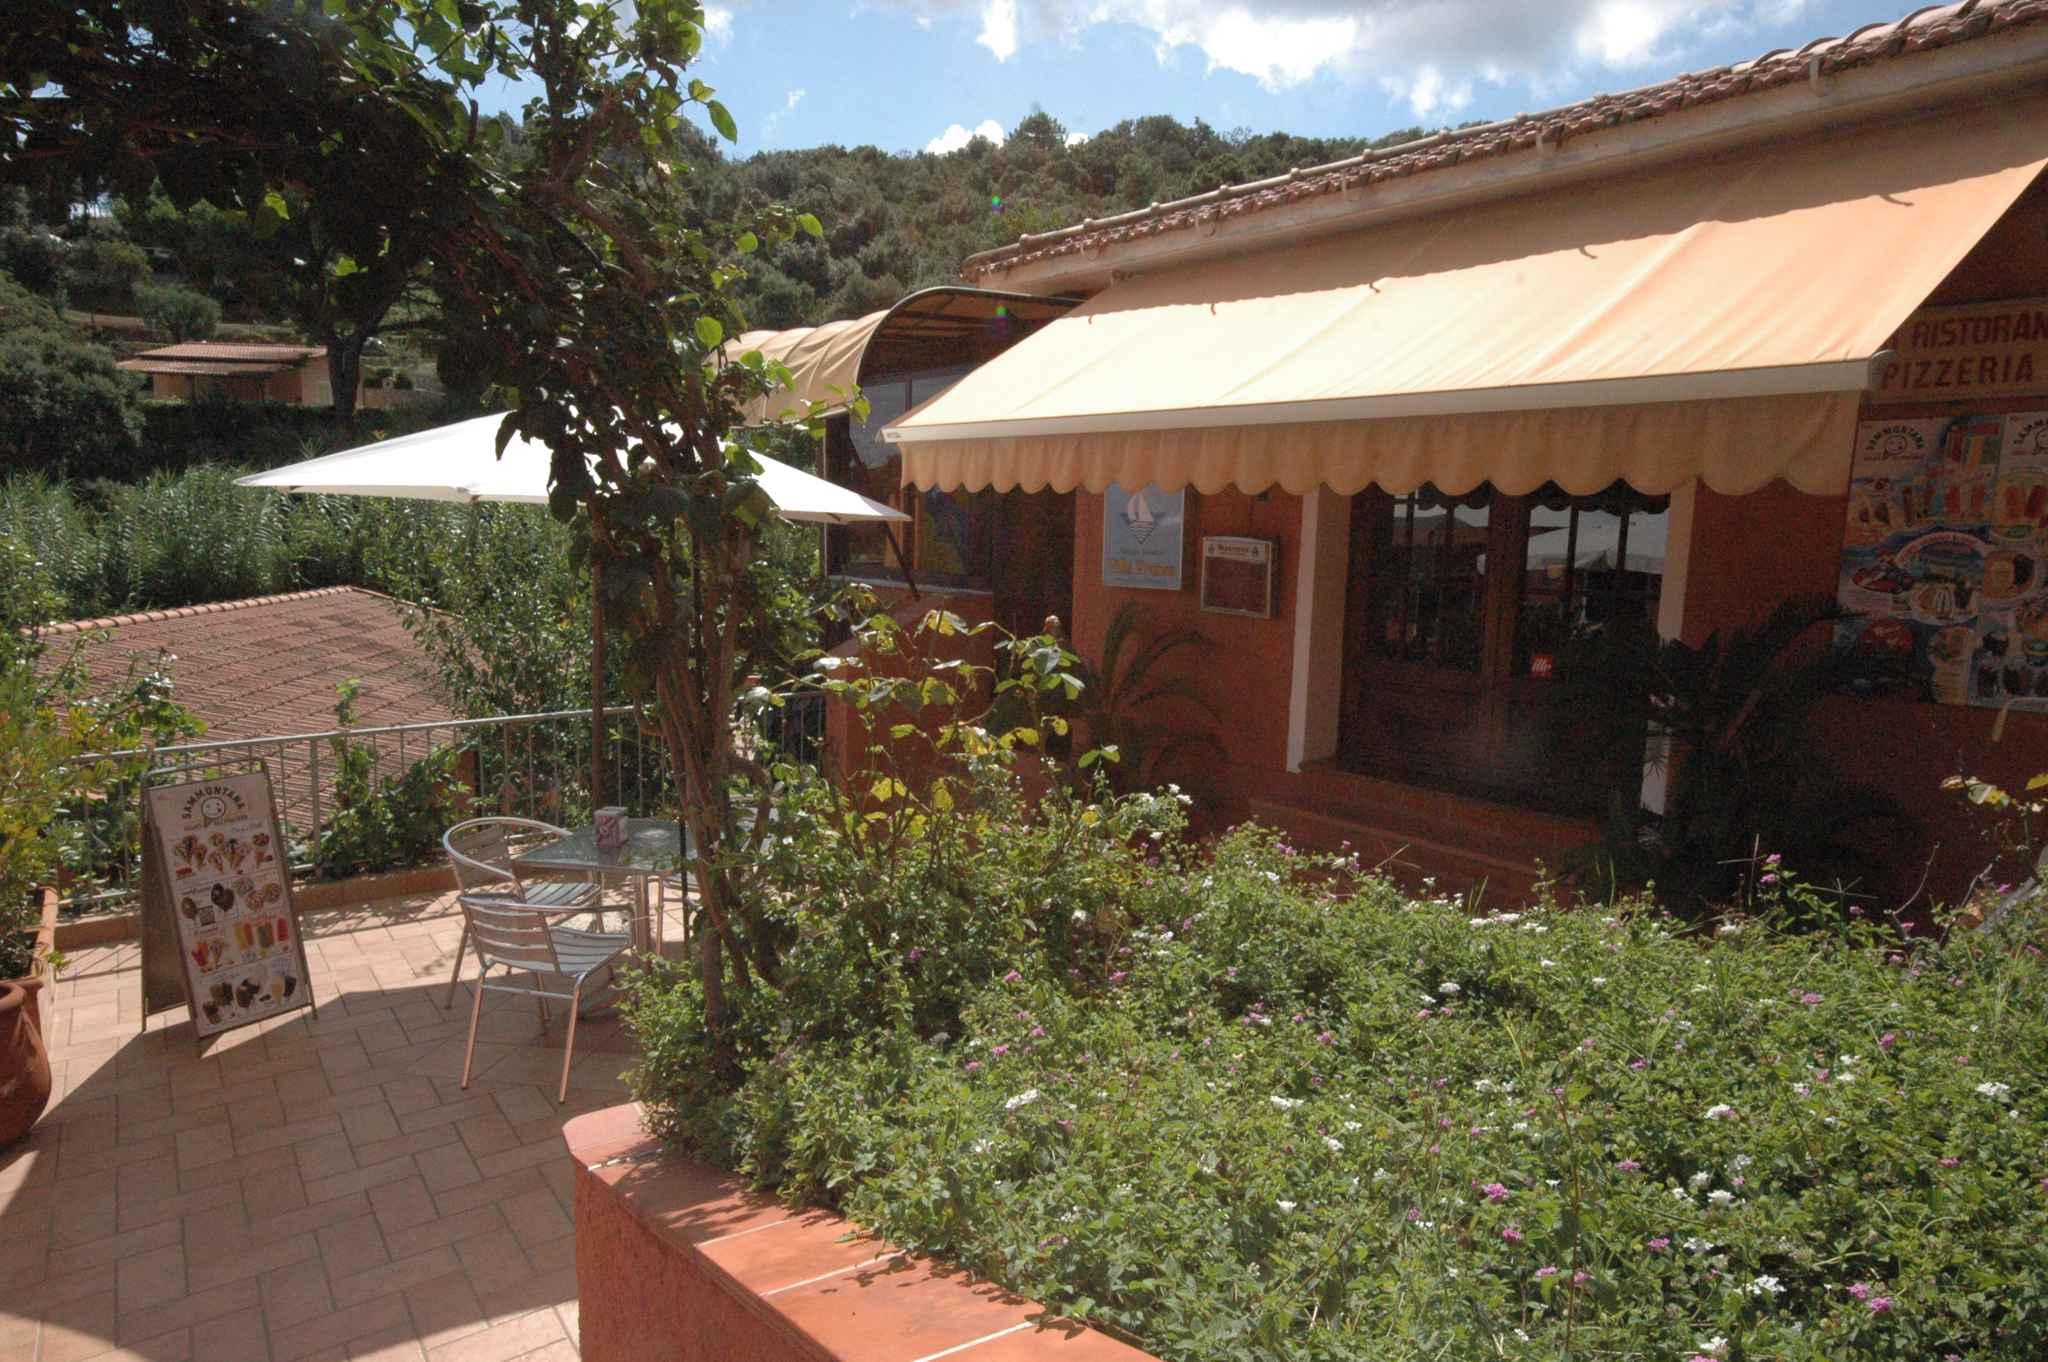 Ferienwohnung mit Panoramablick (404925), Capoliveri, Elba, Toskana, Italien, Bild 13